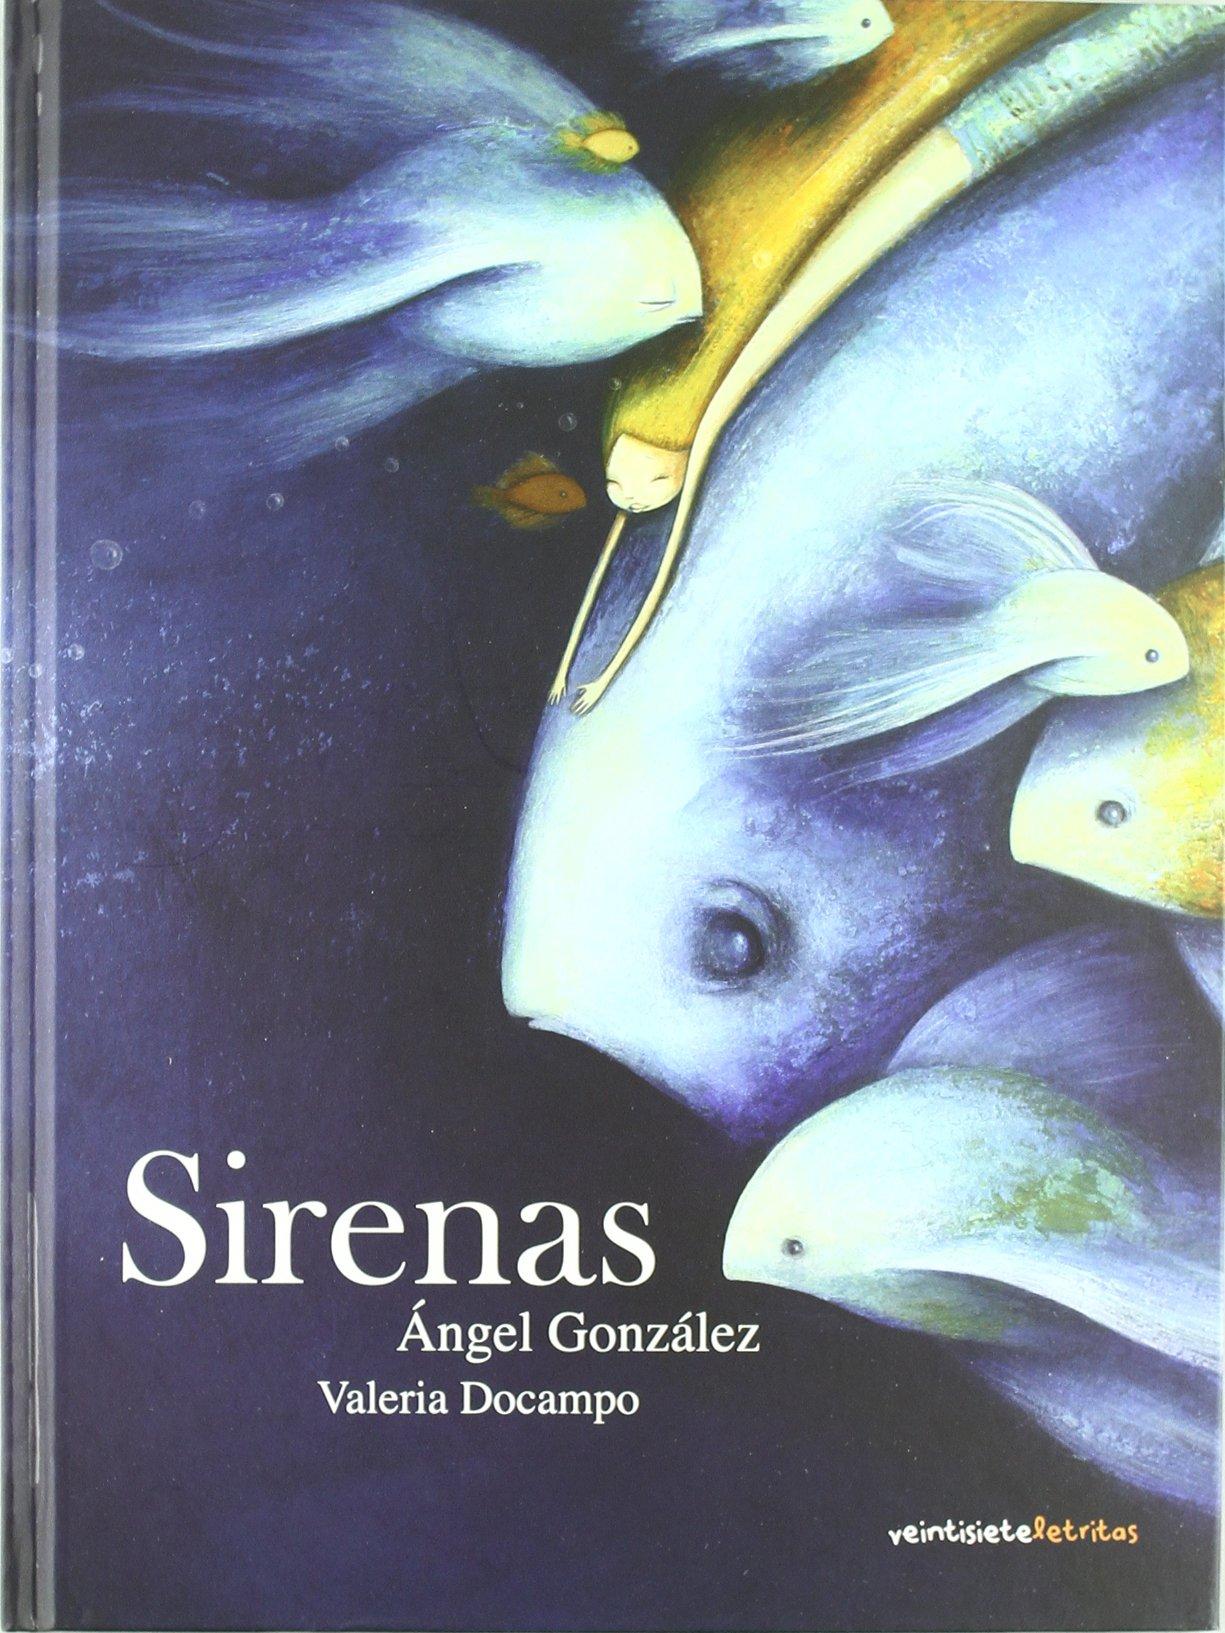 Sirenas (Veintisiete Letritas): Amazon.es: Ángel González, Valeria Docampo: Libros